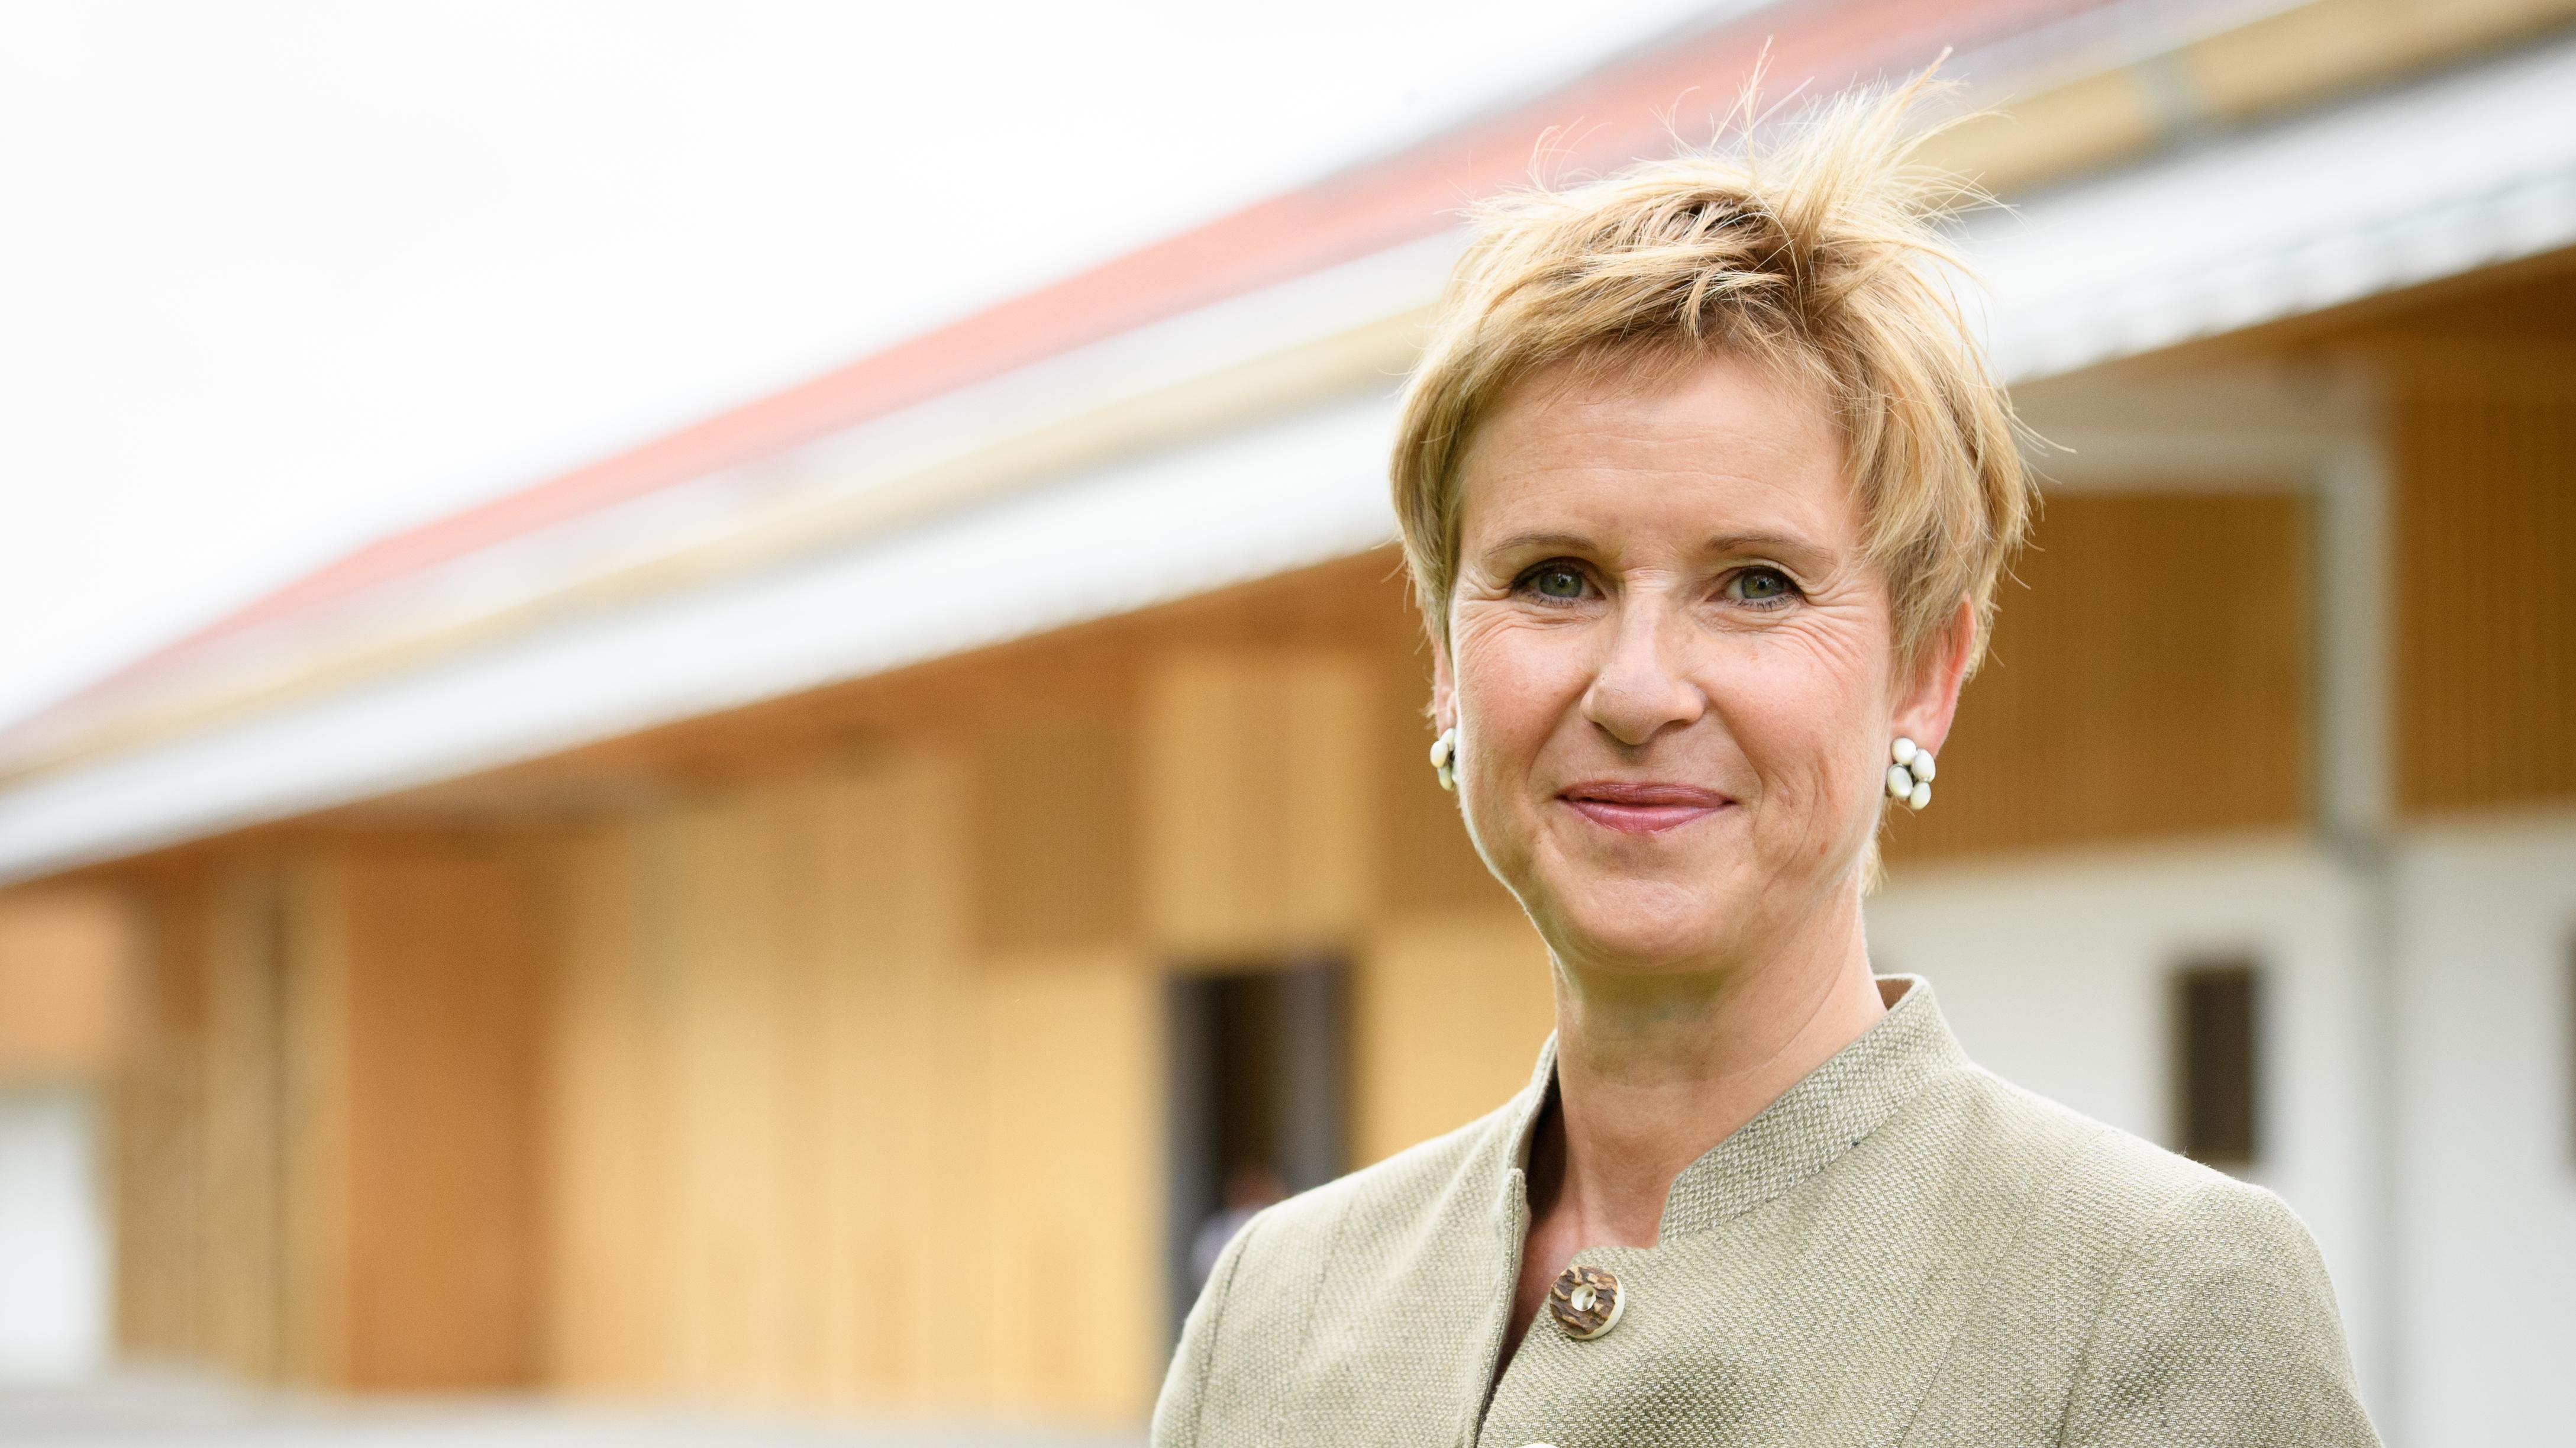 Susanne Klatten im Portrait.